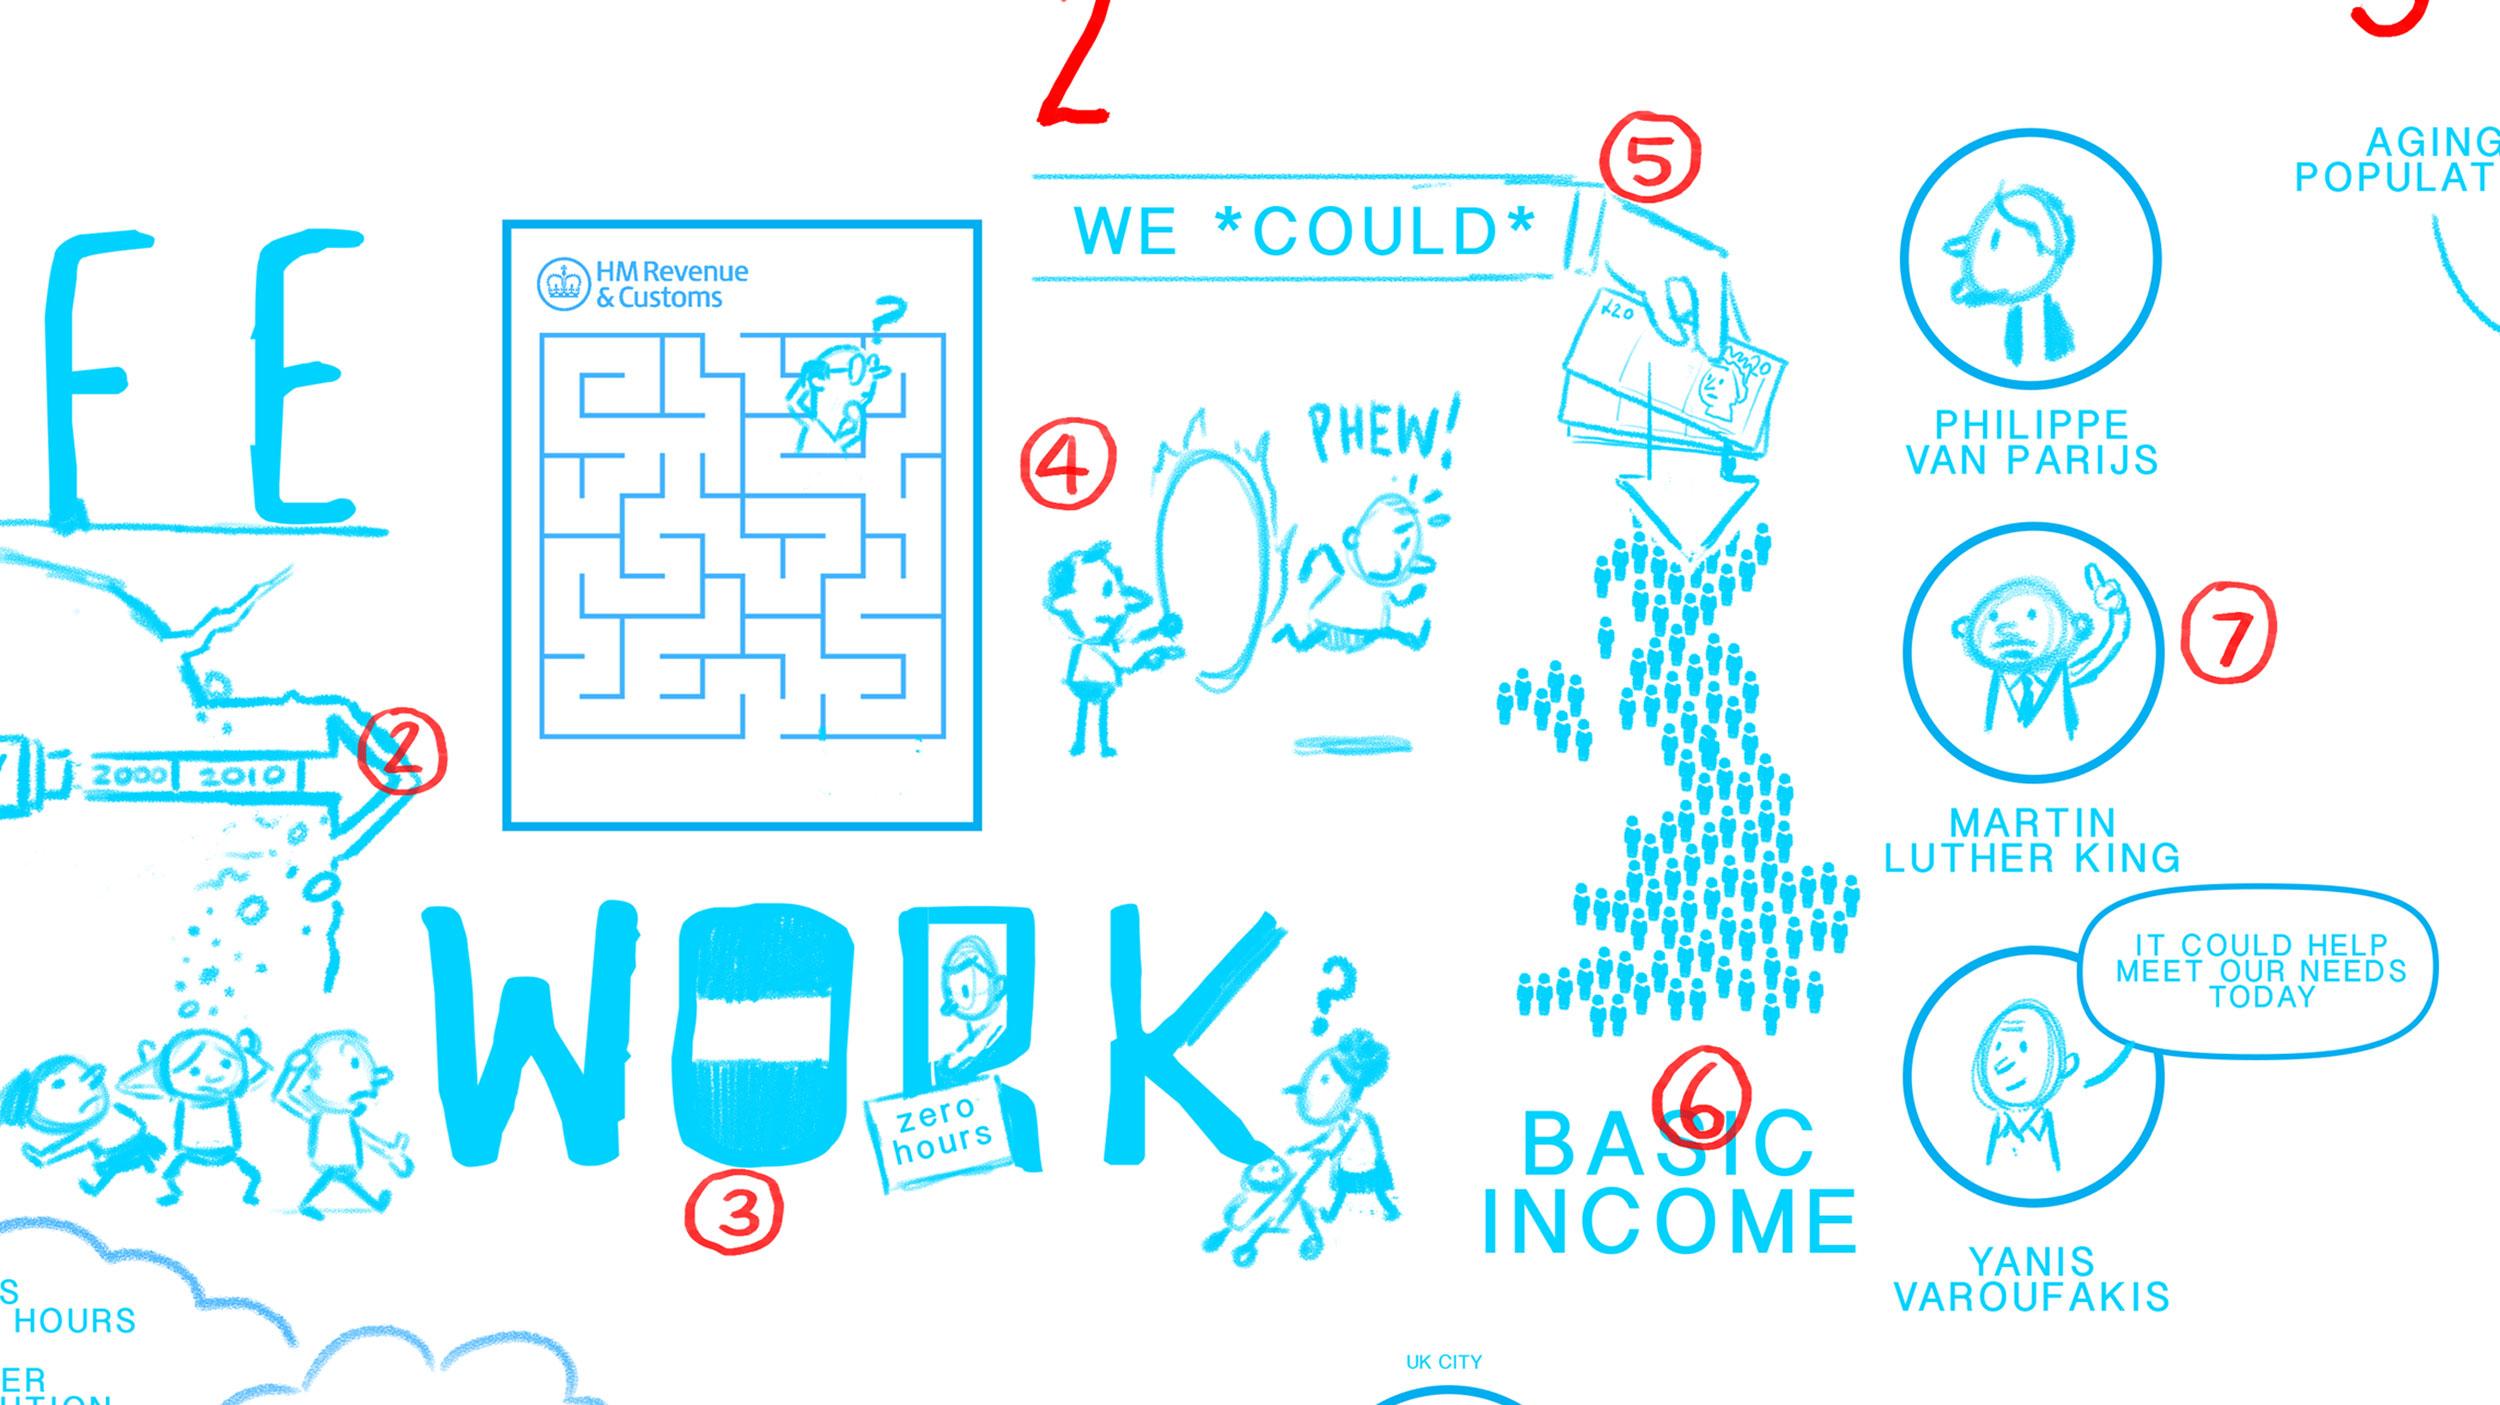 rsa-basic-income-cognitive-01.jpg